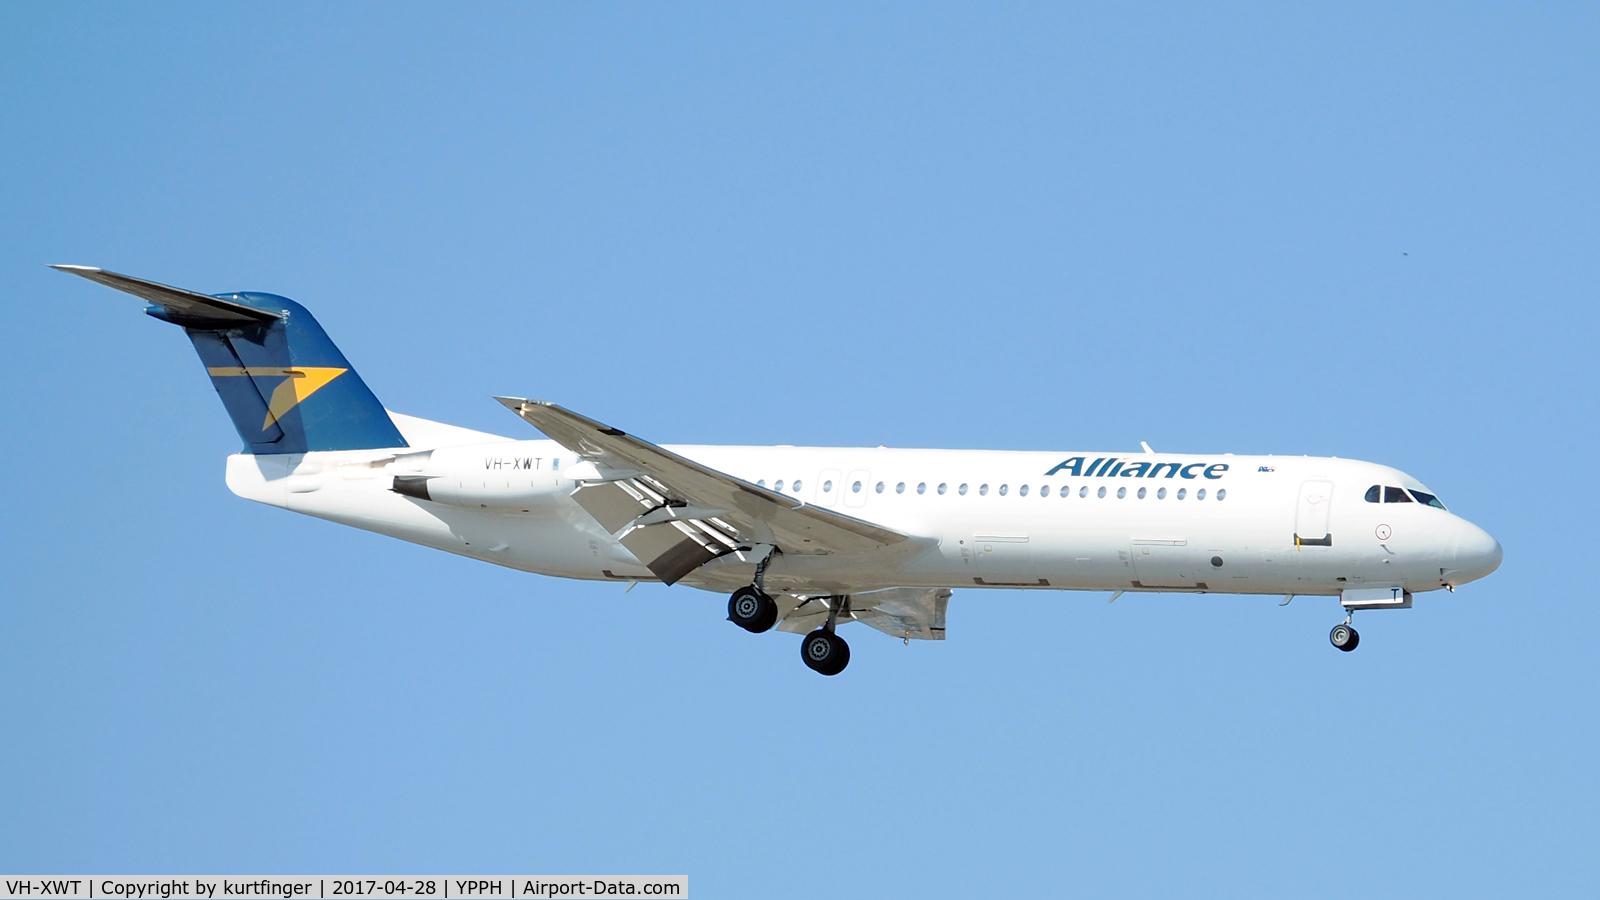 VH-XWT, 1991 Fokker 100 (F-28-0100) C/N 11338, Fokker 100. Alliance Airlines VH-XWT, final runway 21 Perth Int'l 28/04/17.